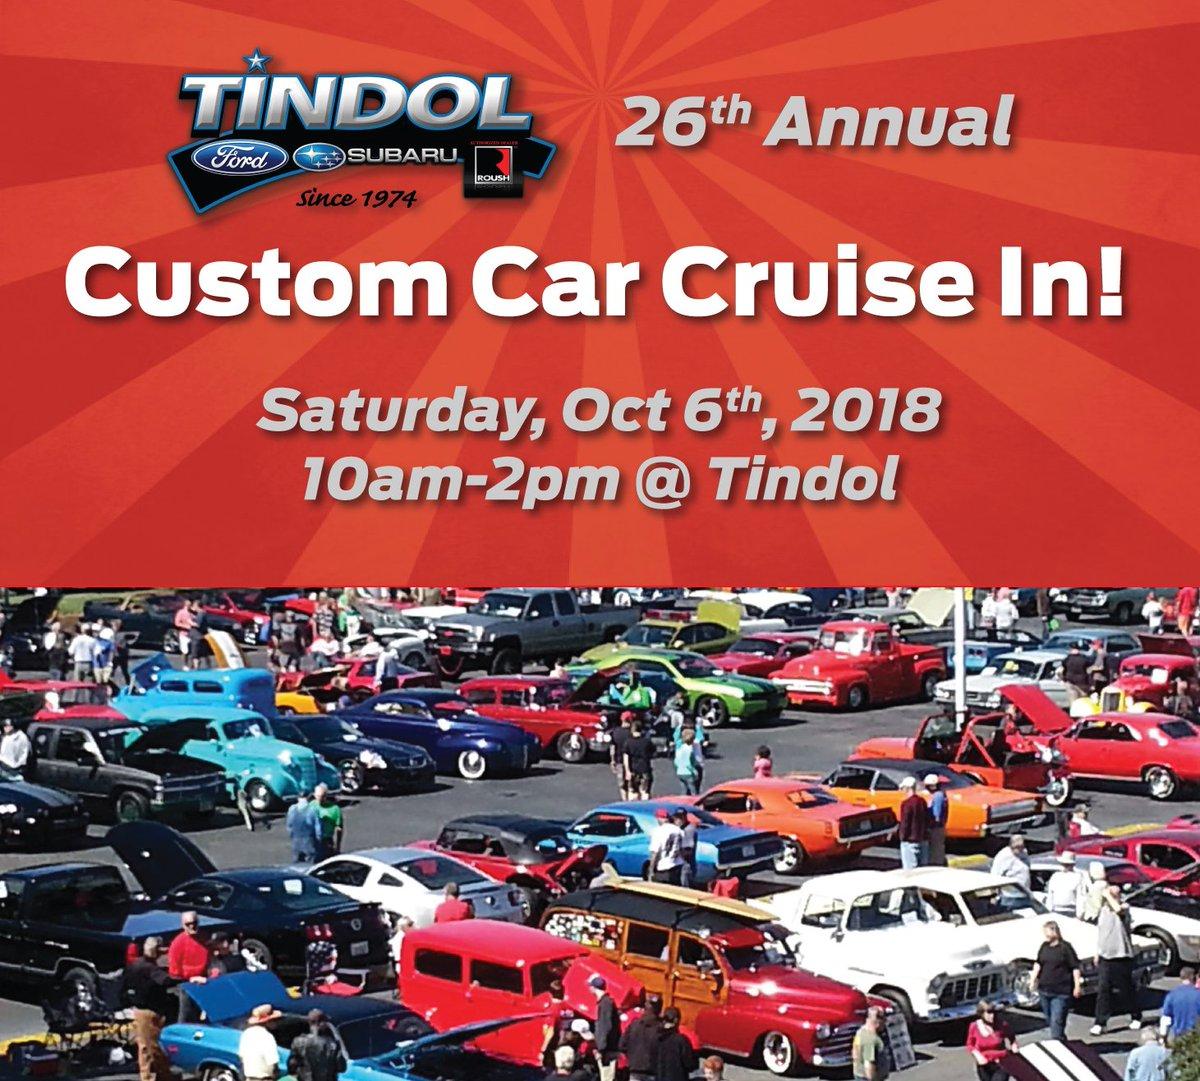 Tindol Subaru TindolSubaru Twitter - Tindol ford car show